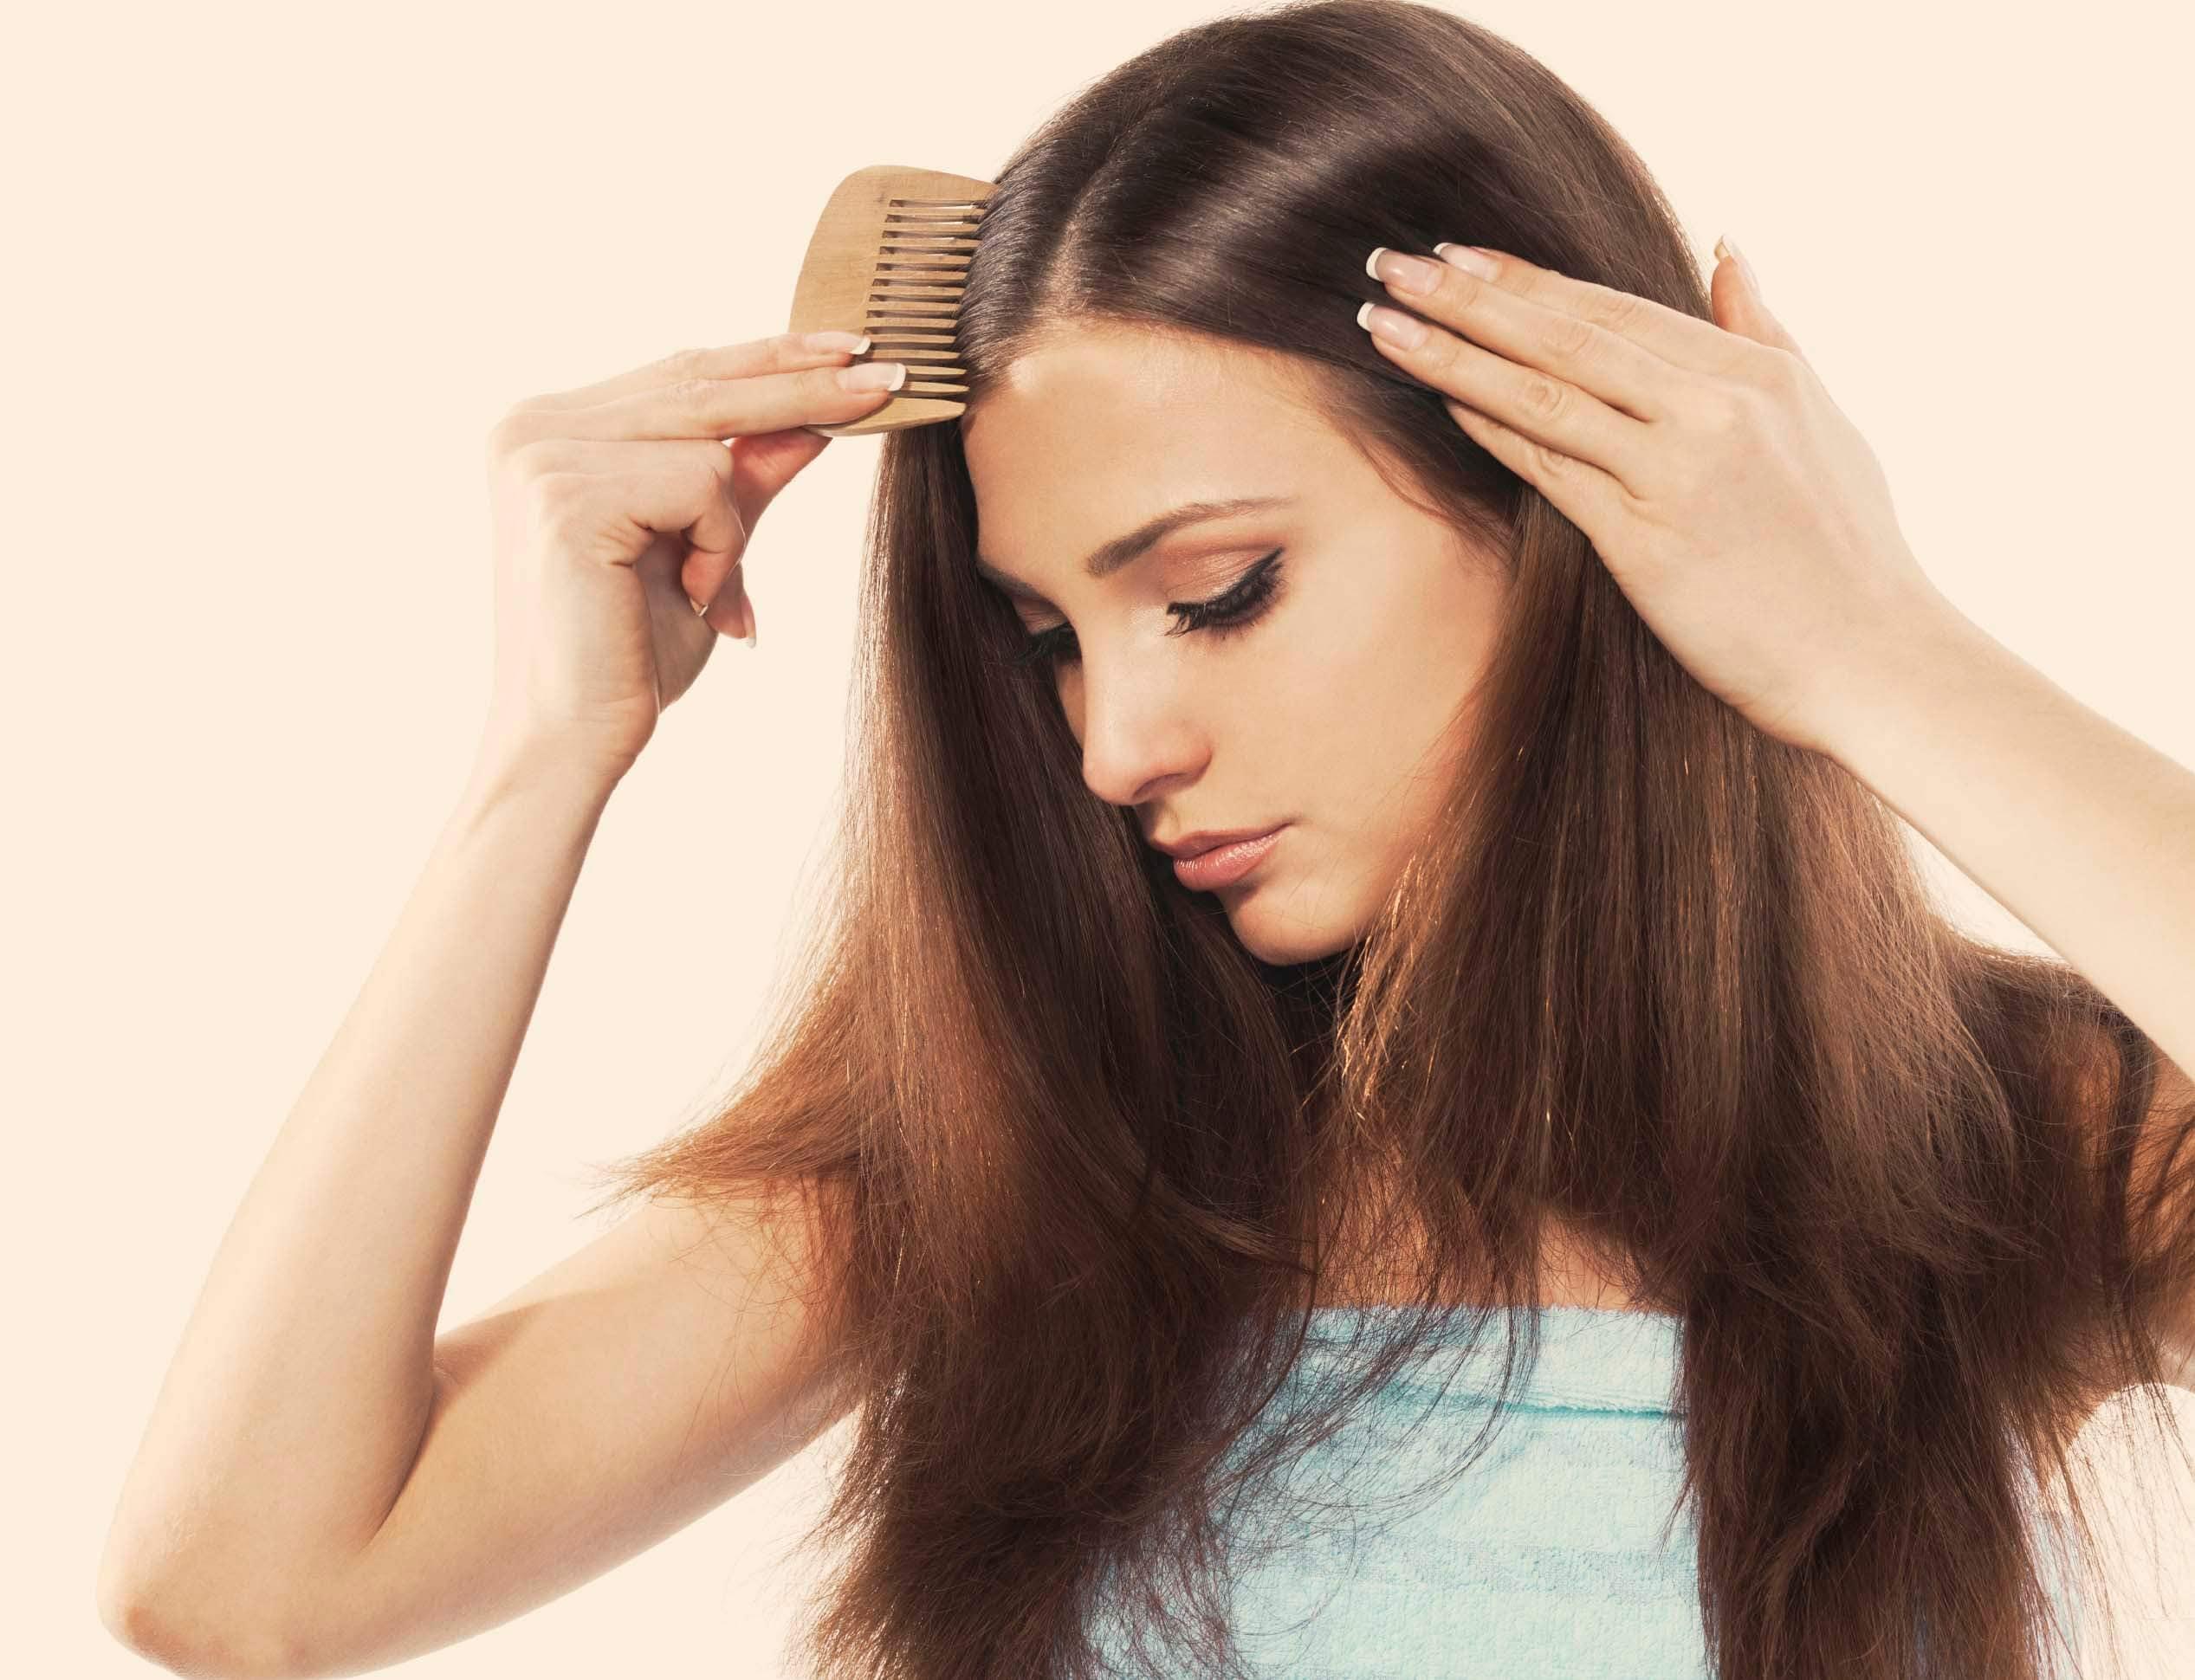 dry scalp vs dandruff woman with hair brush